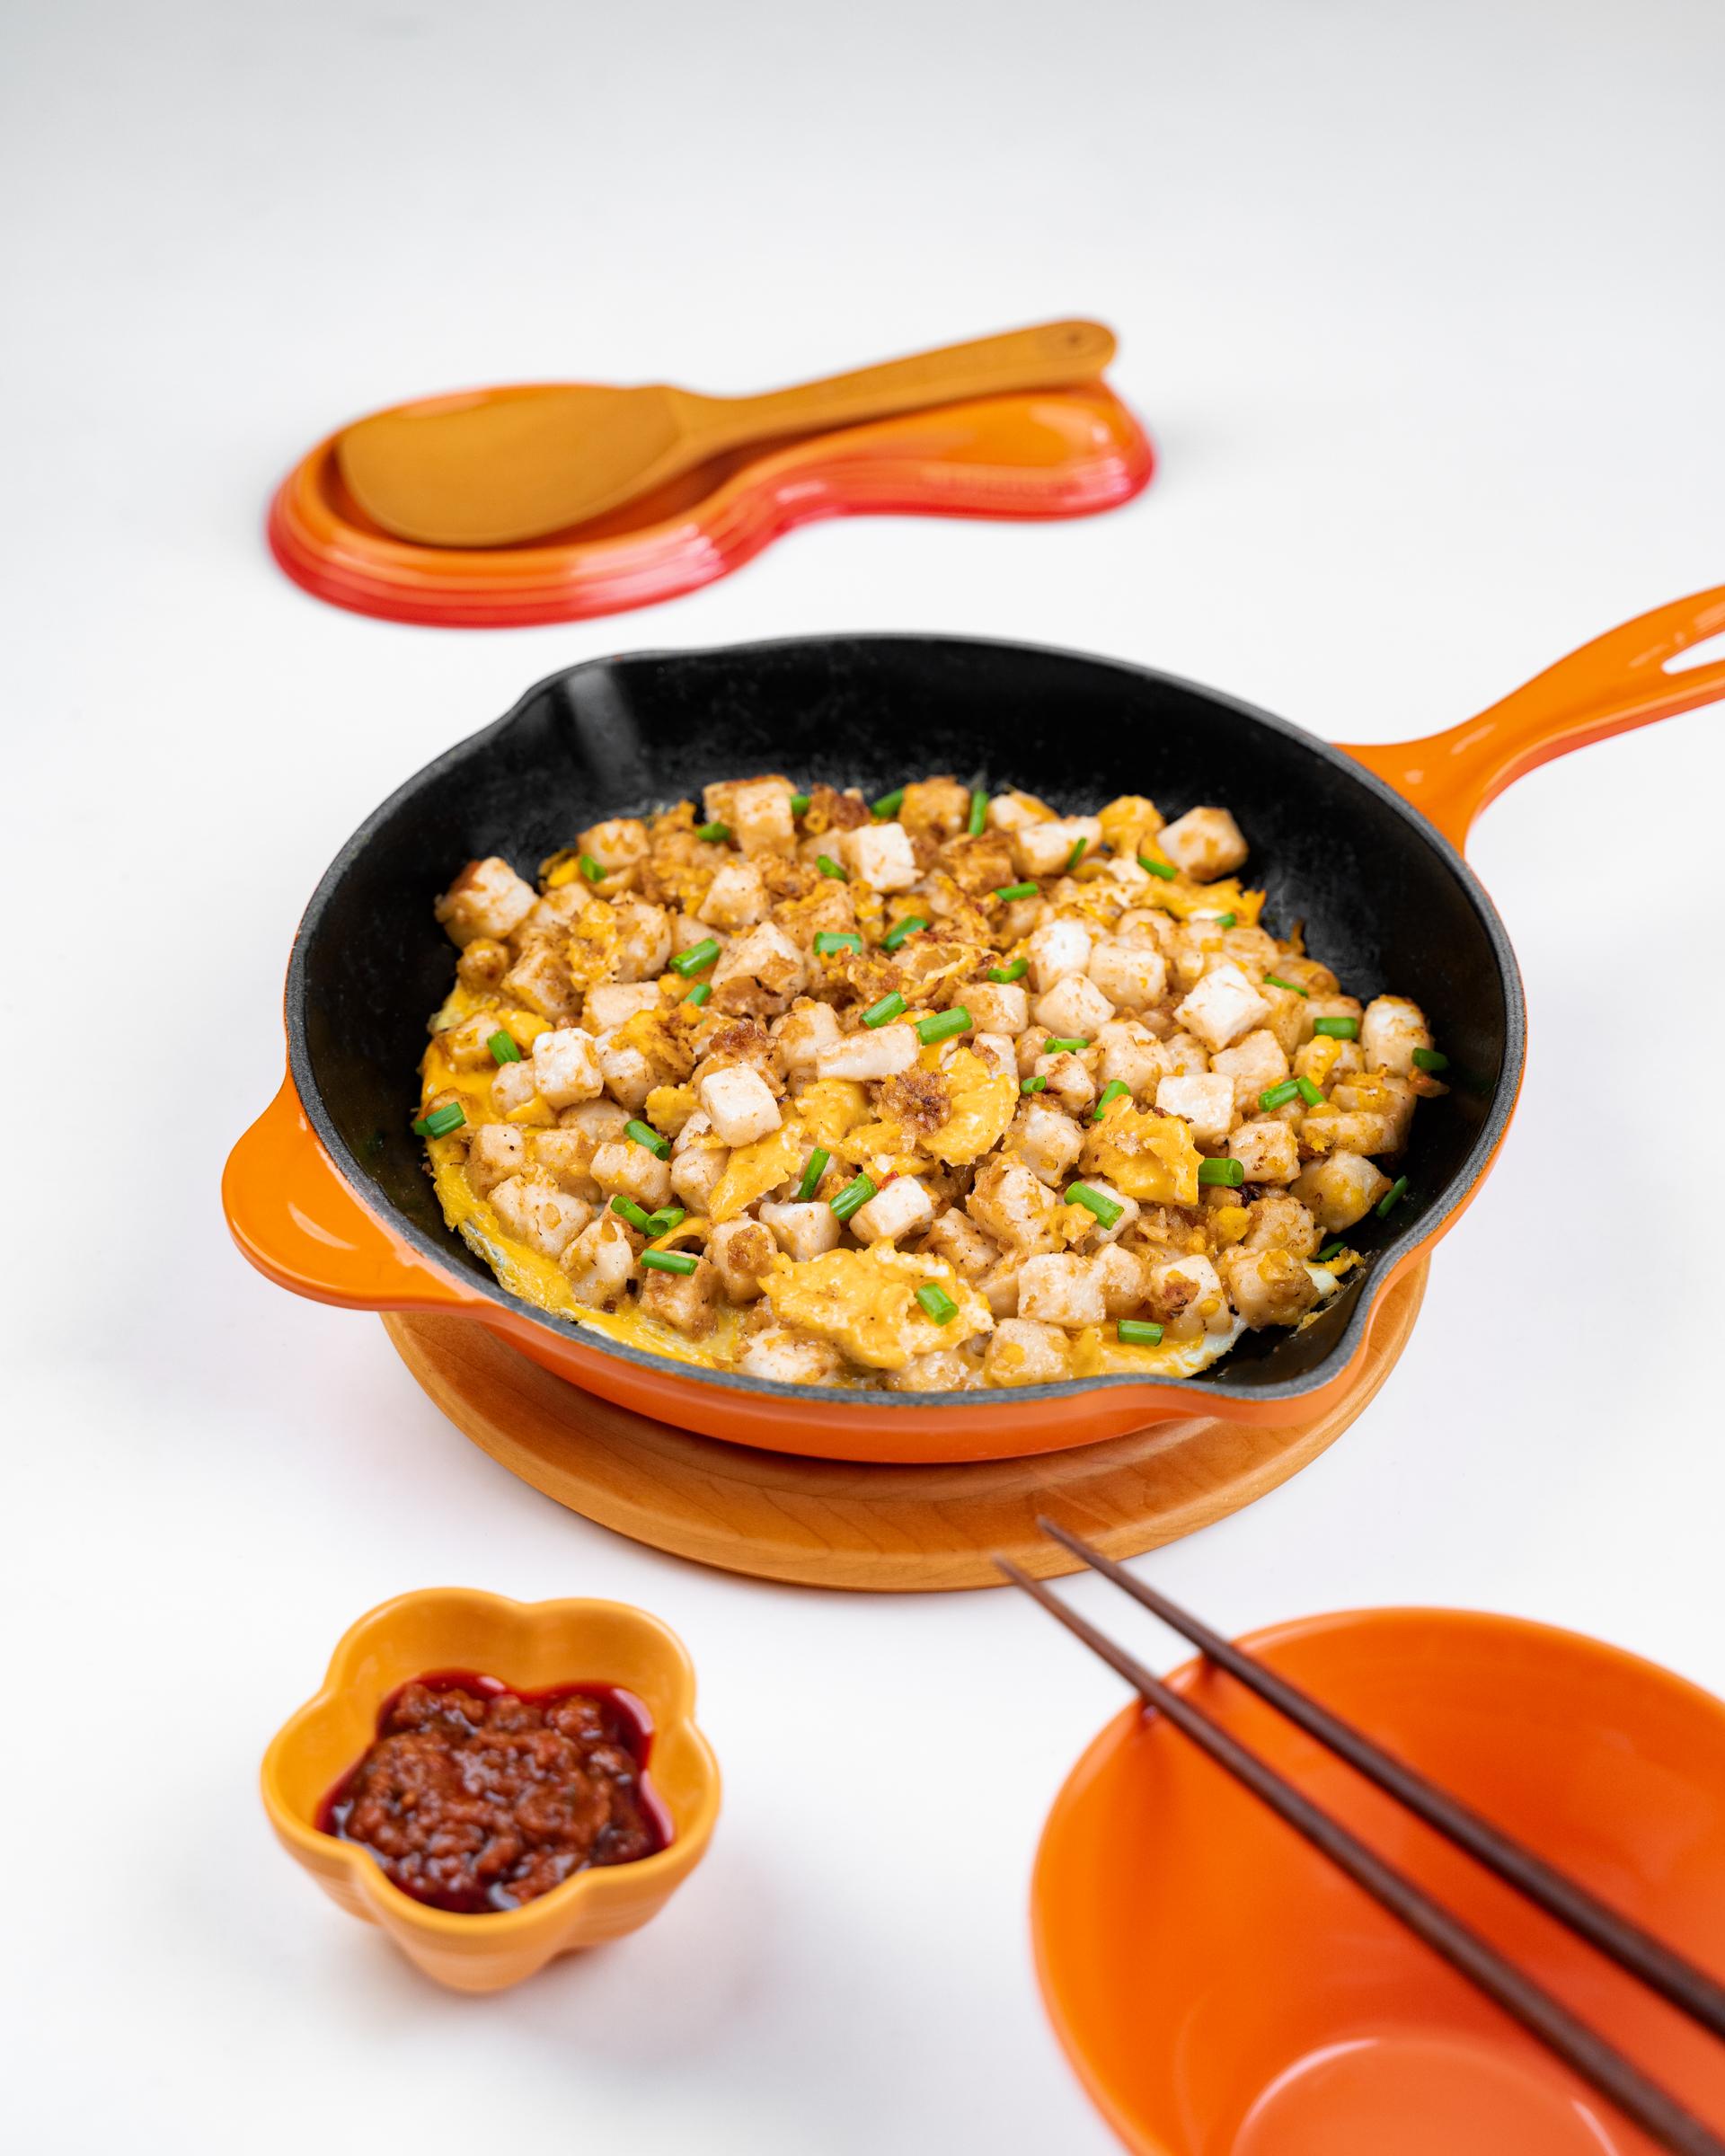 Singaporean Fried Carrot Cake (Serves 3-4)